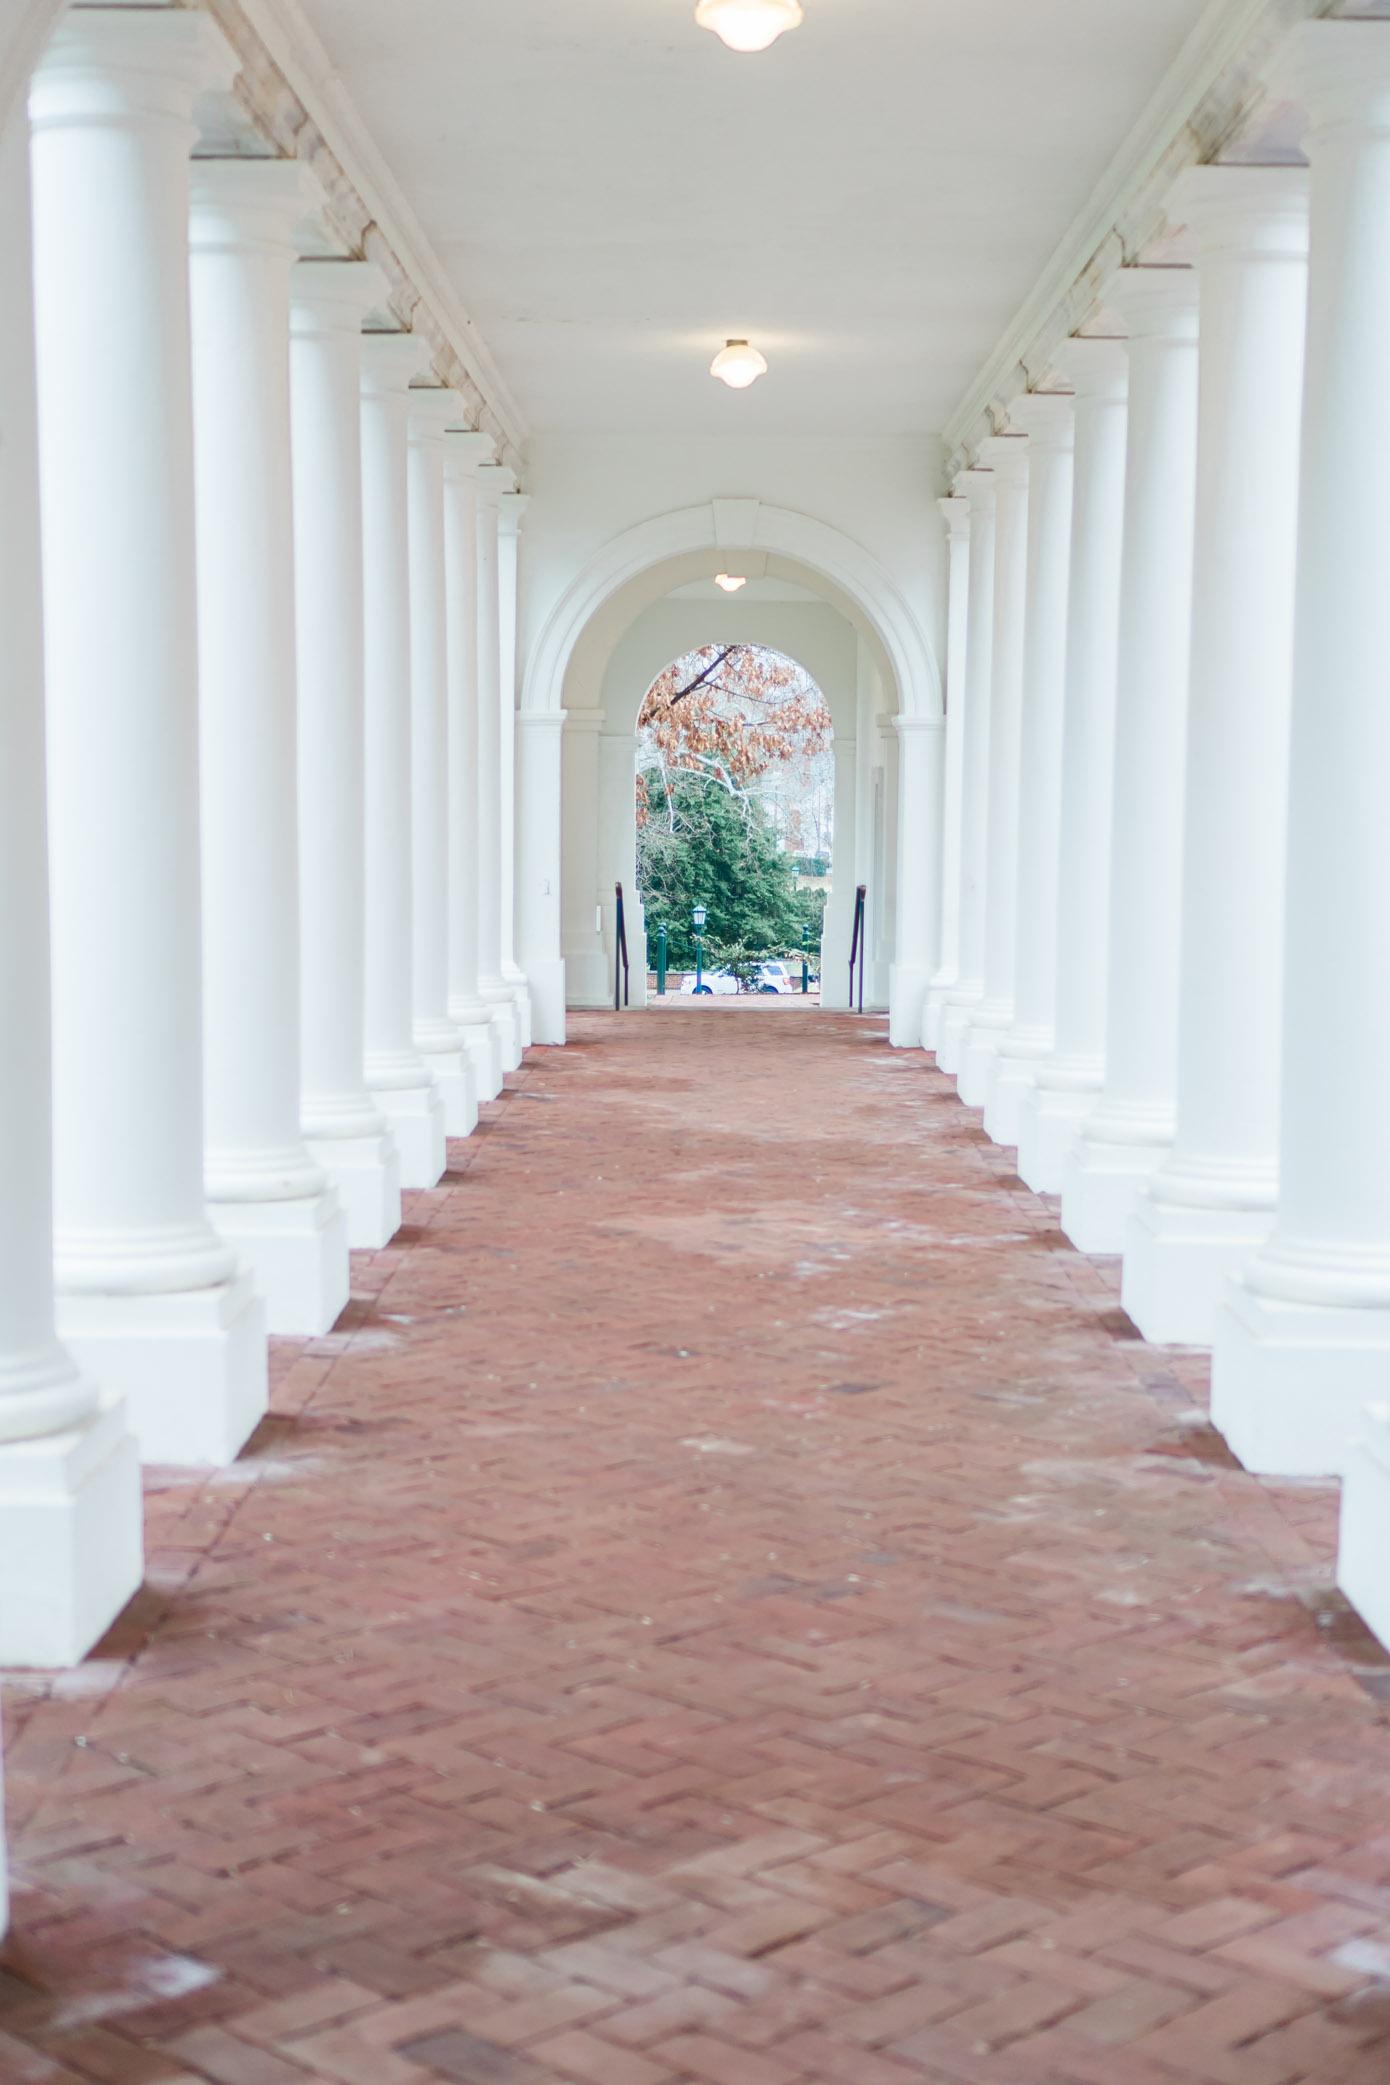 Charlottesville VA Travel Guide   UVA Campus   Louella Reese Life & Style Blog